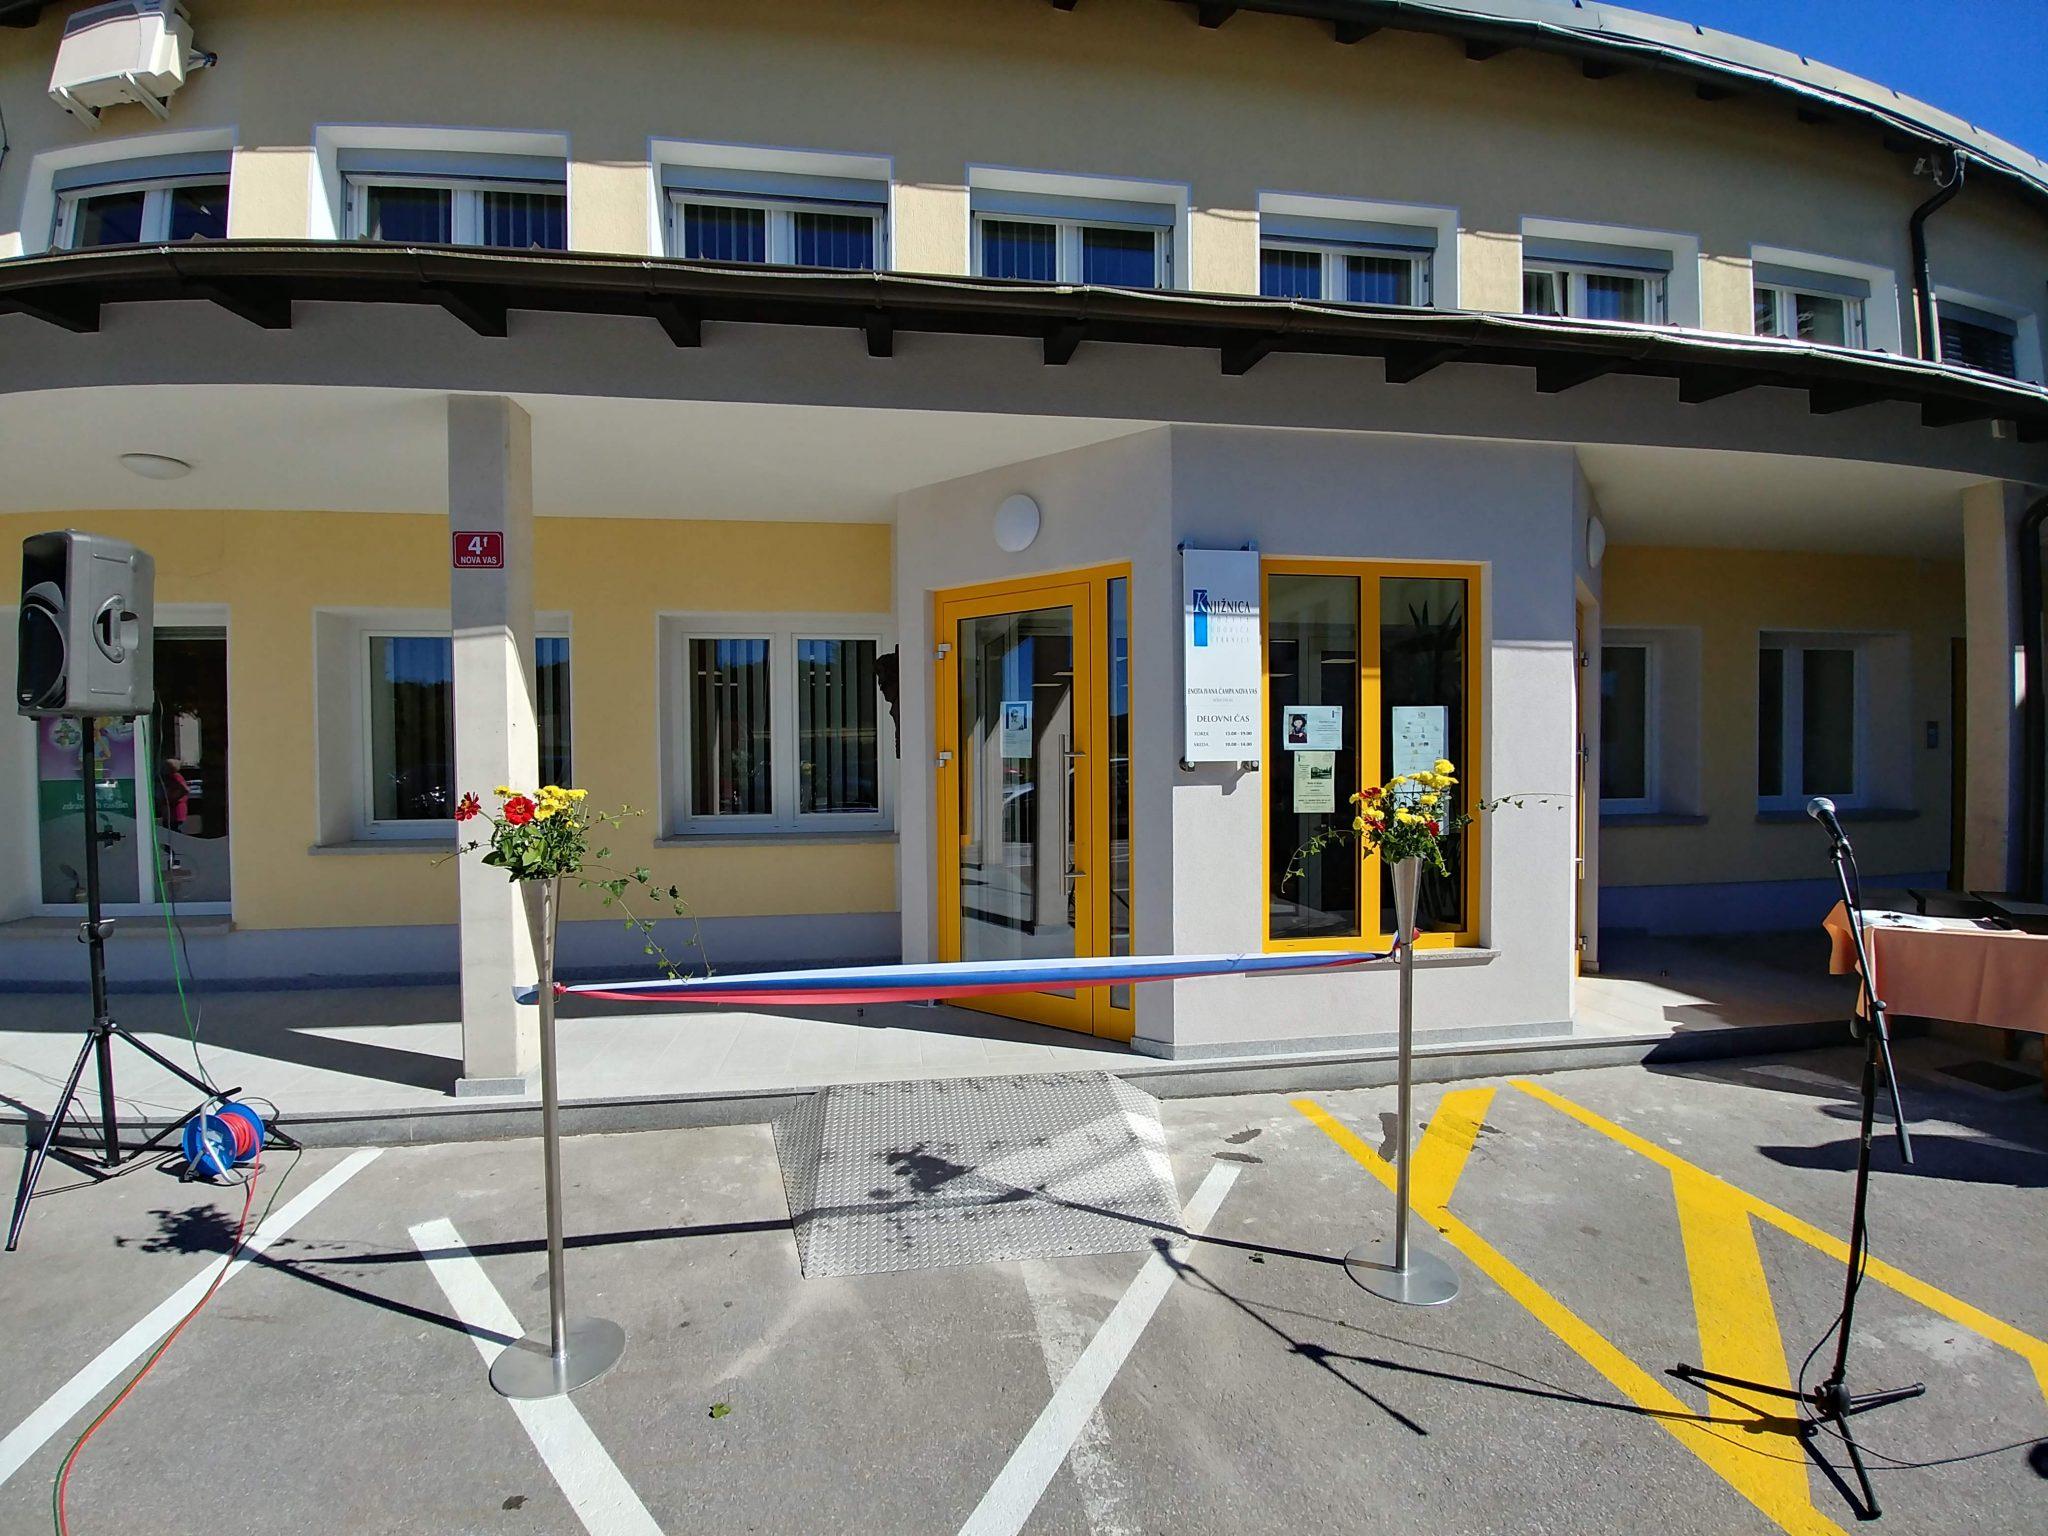 IMG 5232 - Odprtje novih prostorov KJUC – Enota Ivana Čampa Nova vas